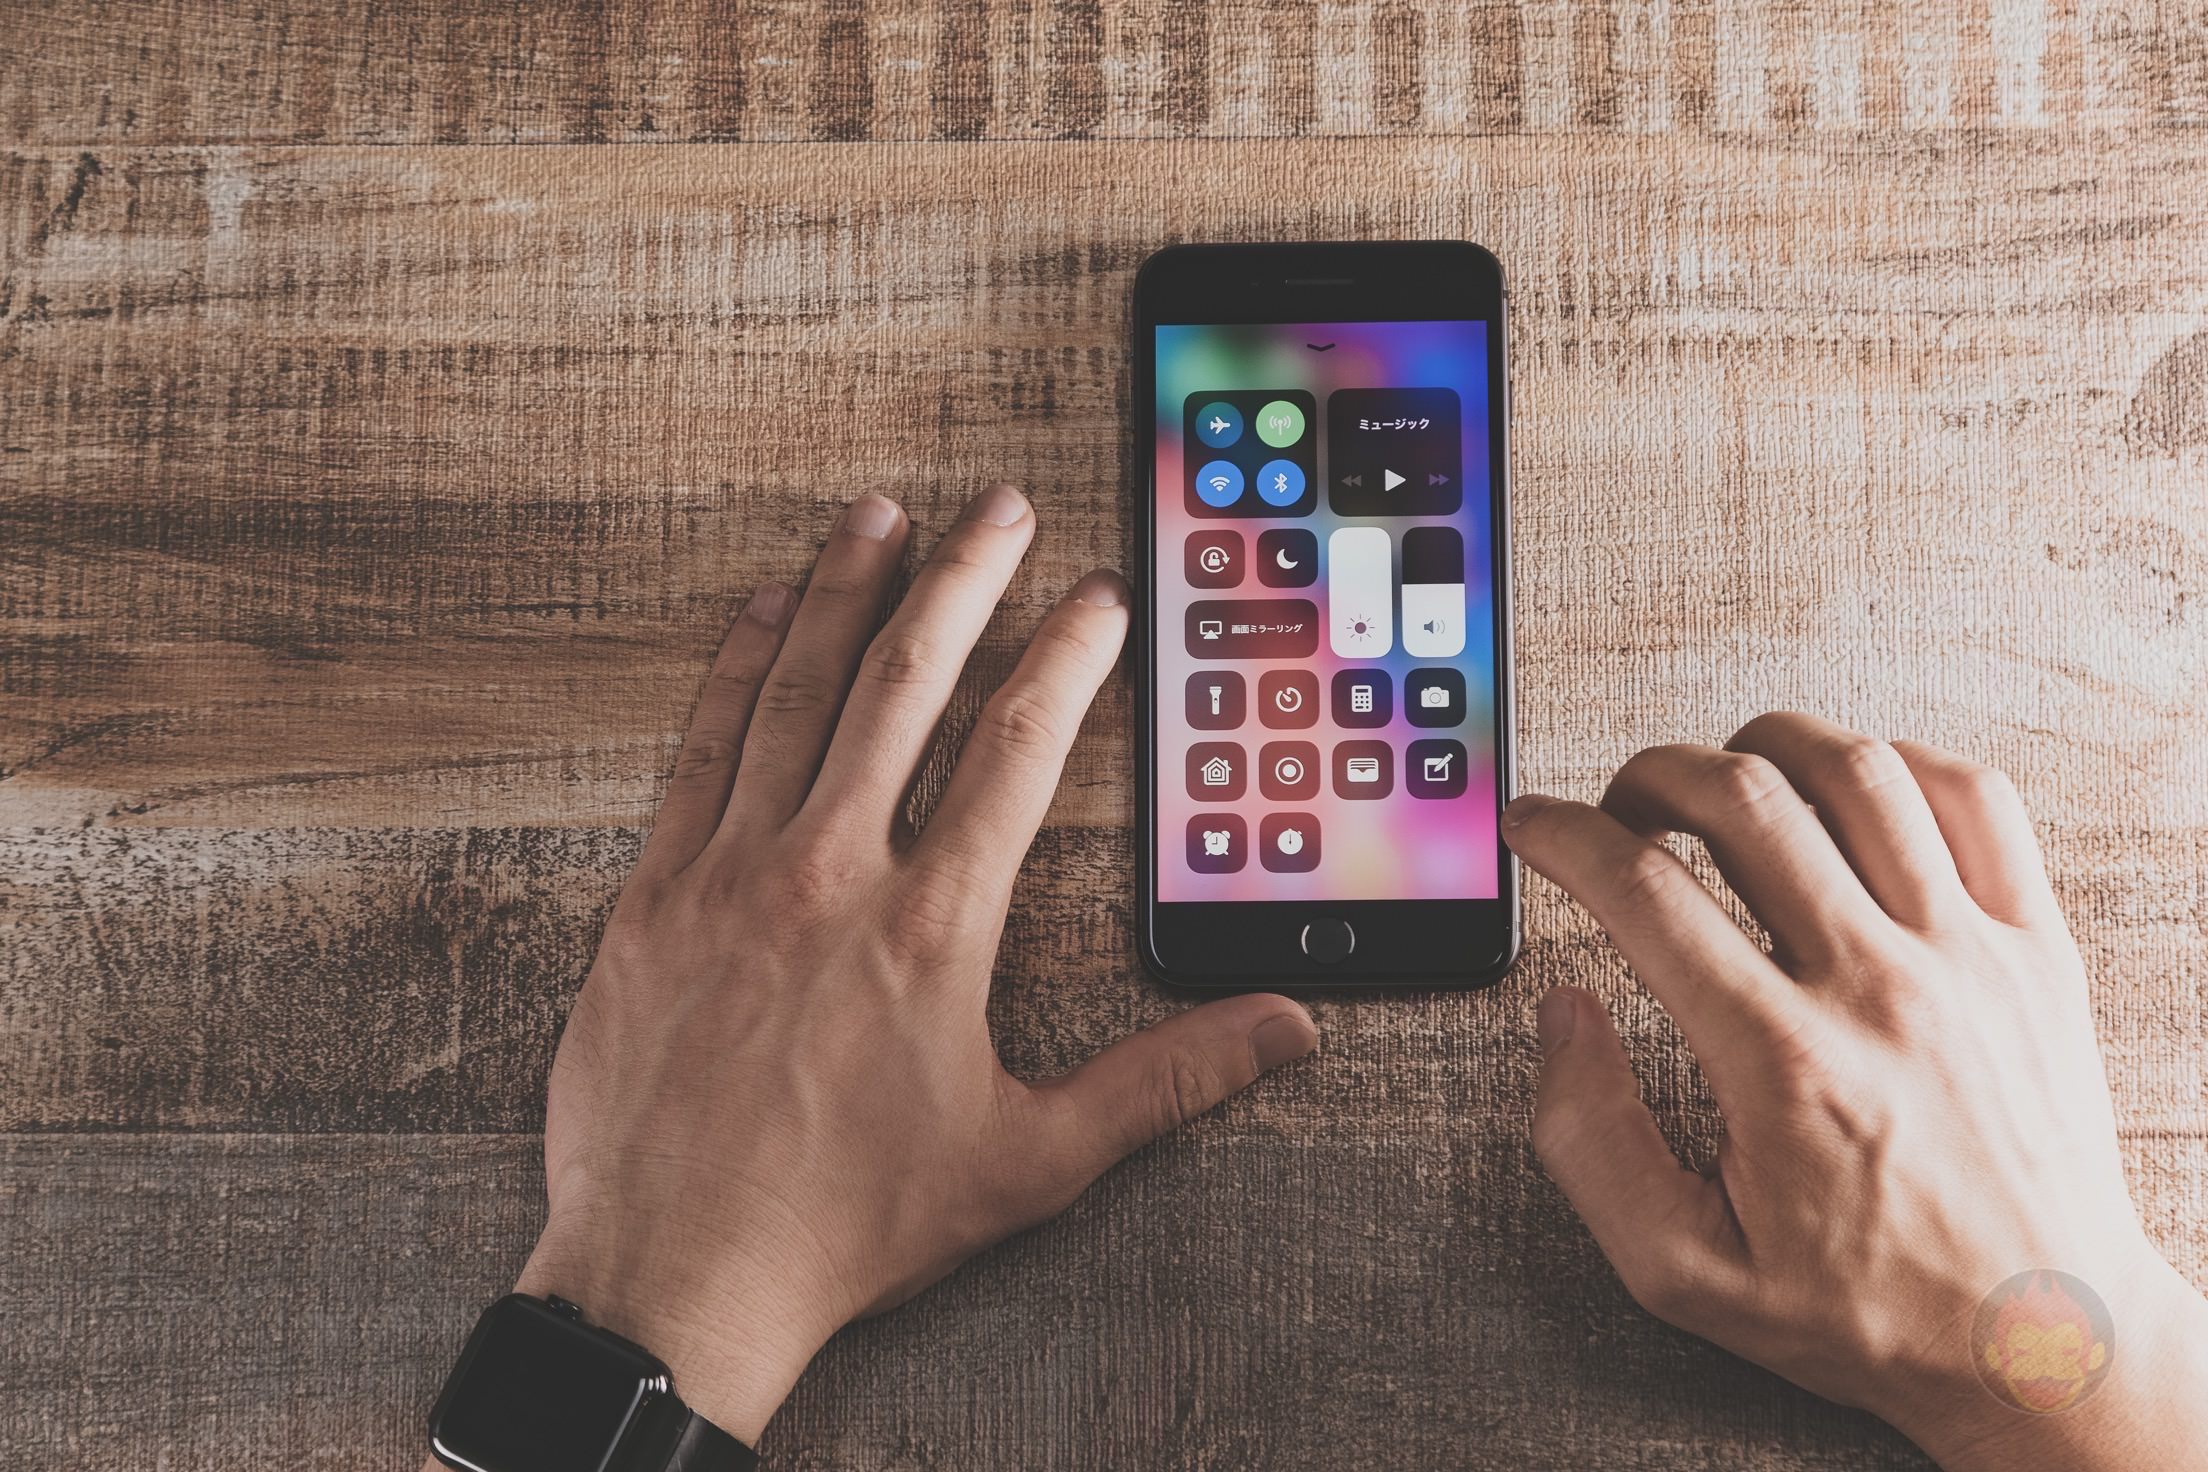 iPhone8-8Plus-Review-48.jpg